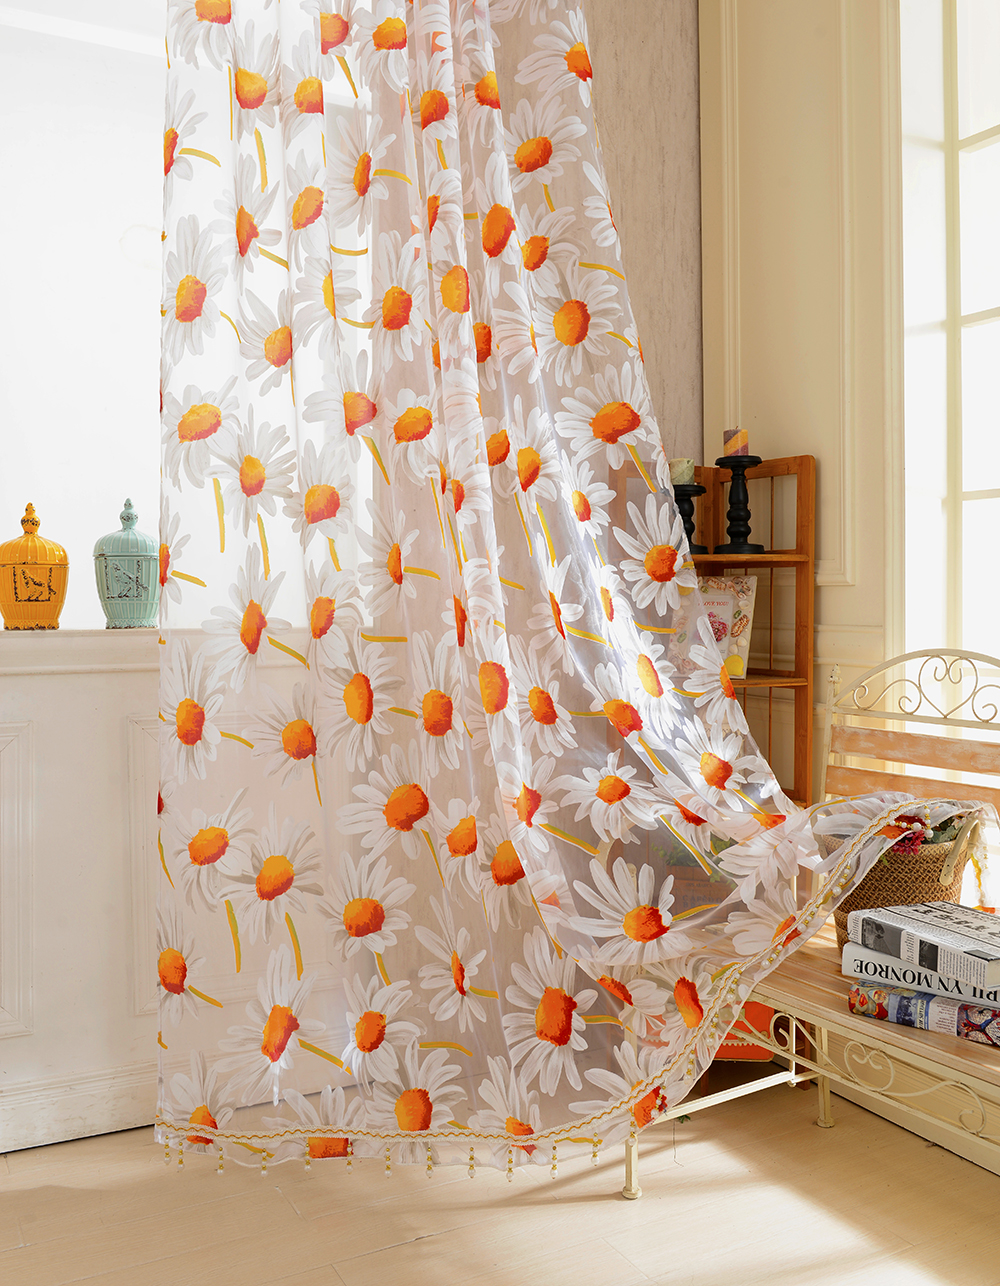 new white orange 1 2 5m sunflower voile window panel sheer tulle drapes decorative curtains for living room bedroom home decor